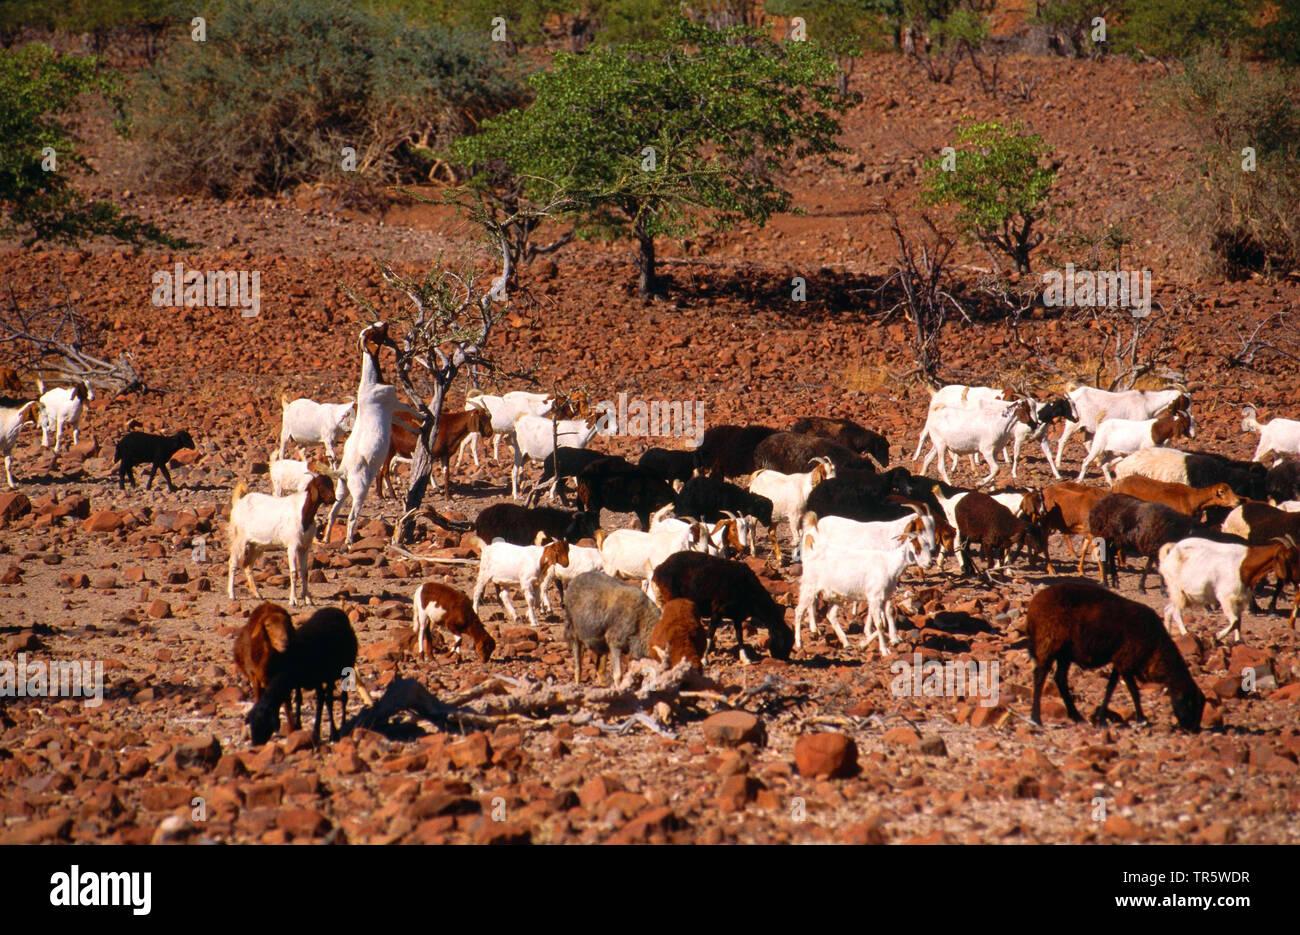 domestic goat (Capra hircus, Capra aegagrus f. hircus), herd of goats searching for food in barren landscape, Namibia, Damaraland - Stock Image